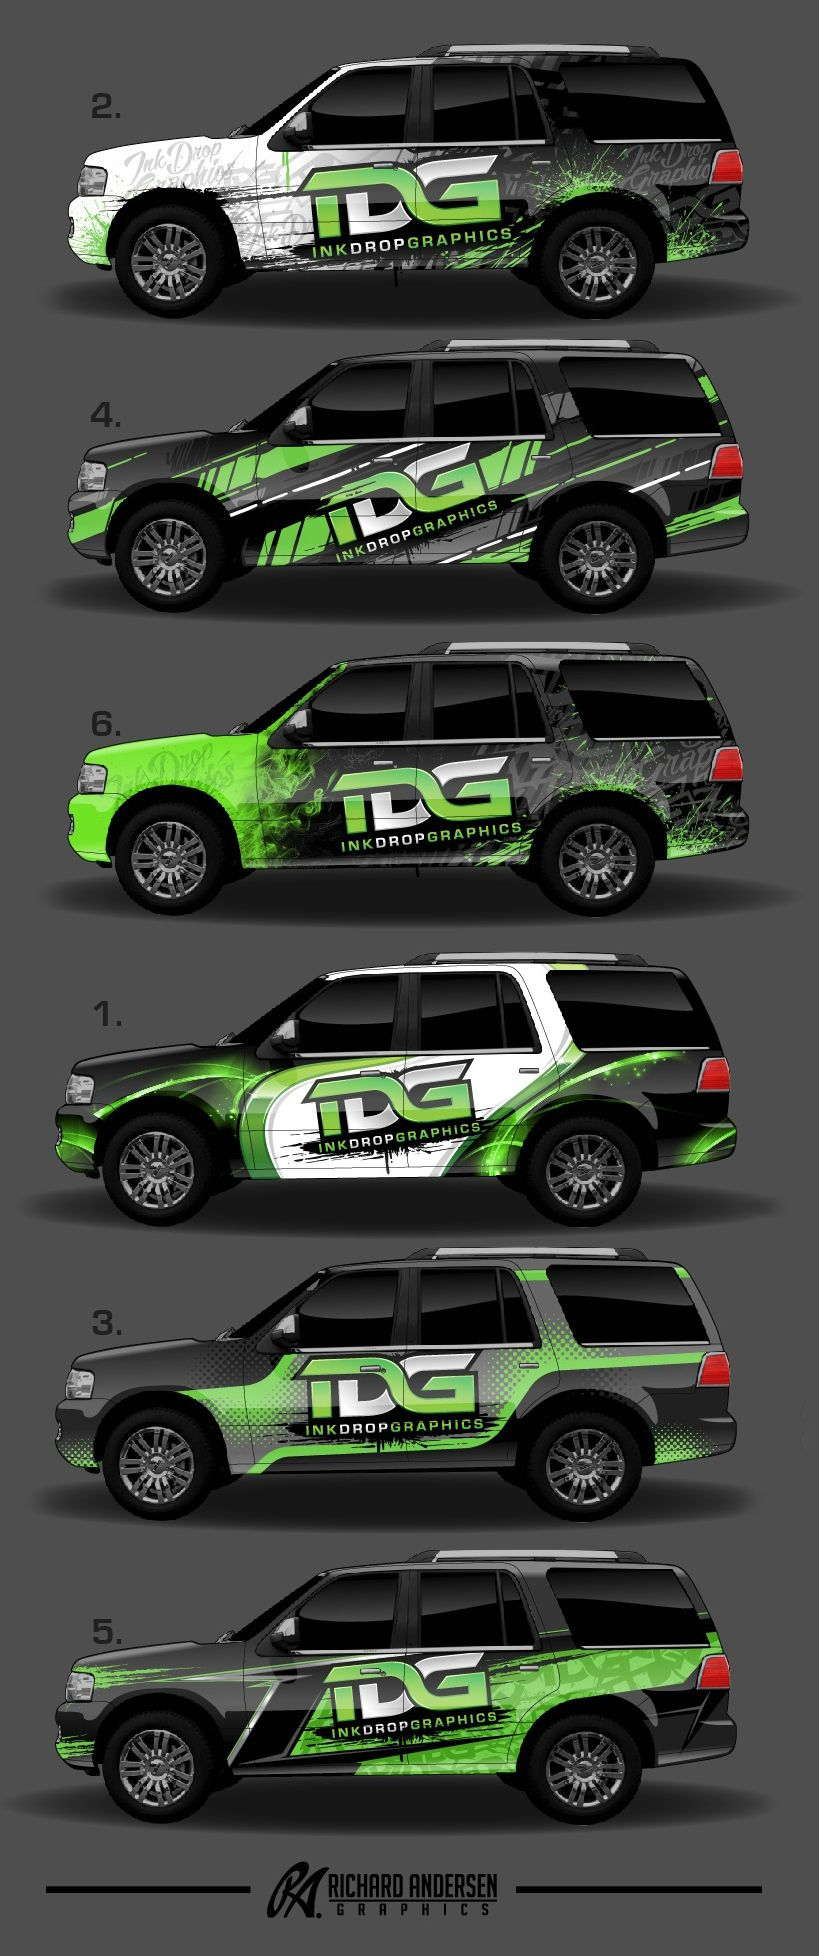 Car Sticker Design Pinterest - Wrap design by richard andersen https ragraphics carbonmade com vehicle wrapscar stickersadvertisingvinyl